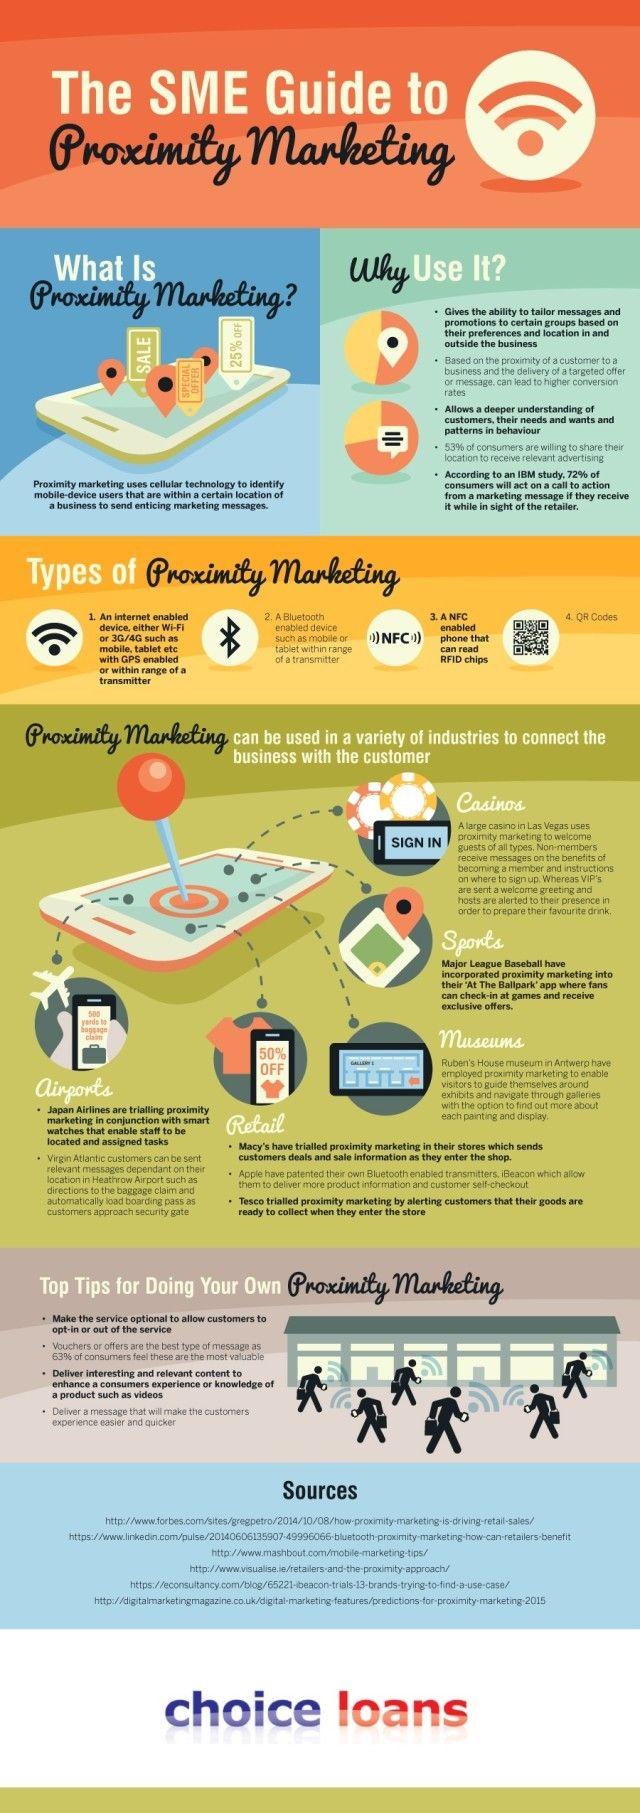 #Marketing #Infographics: The SME Guide to Proximity Marketing